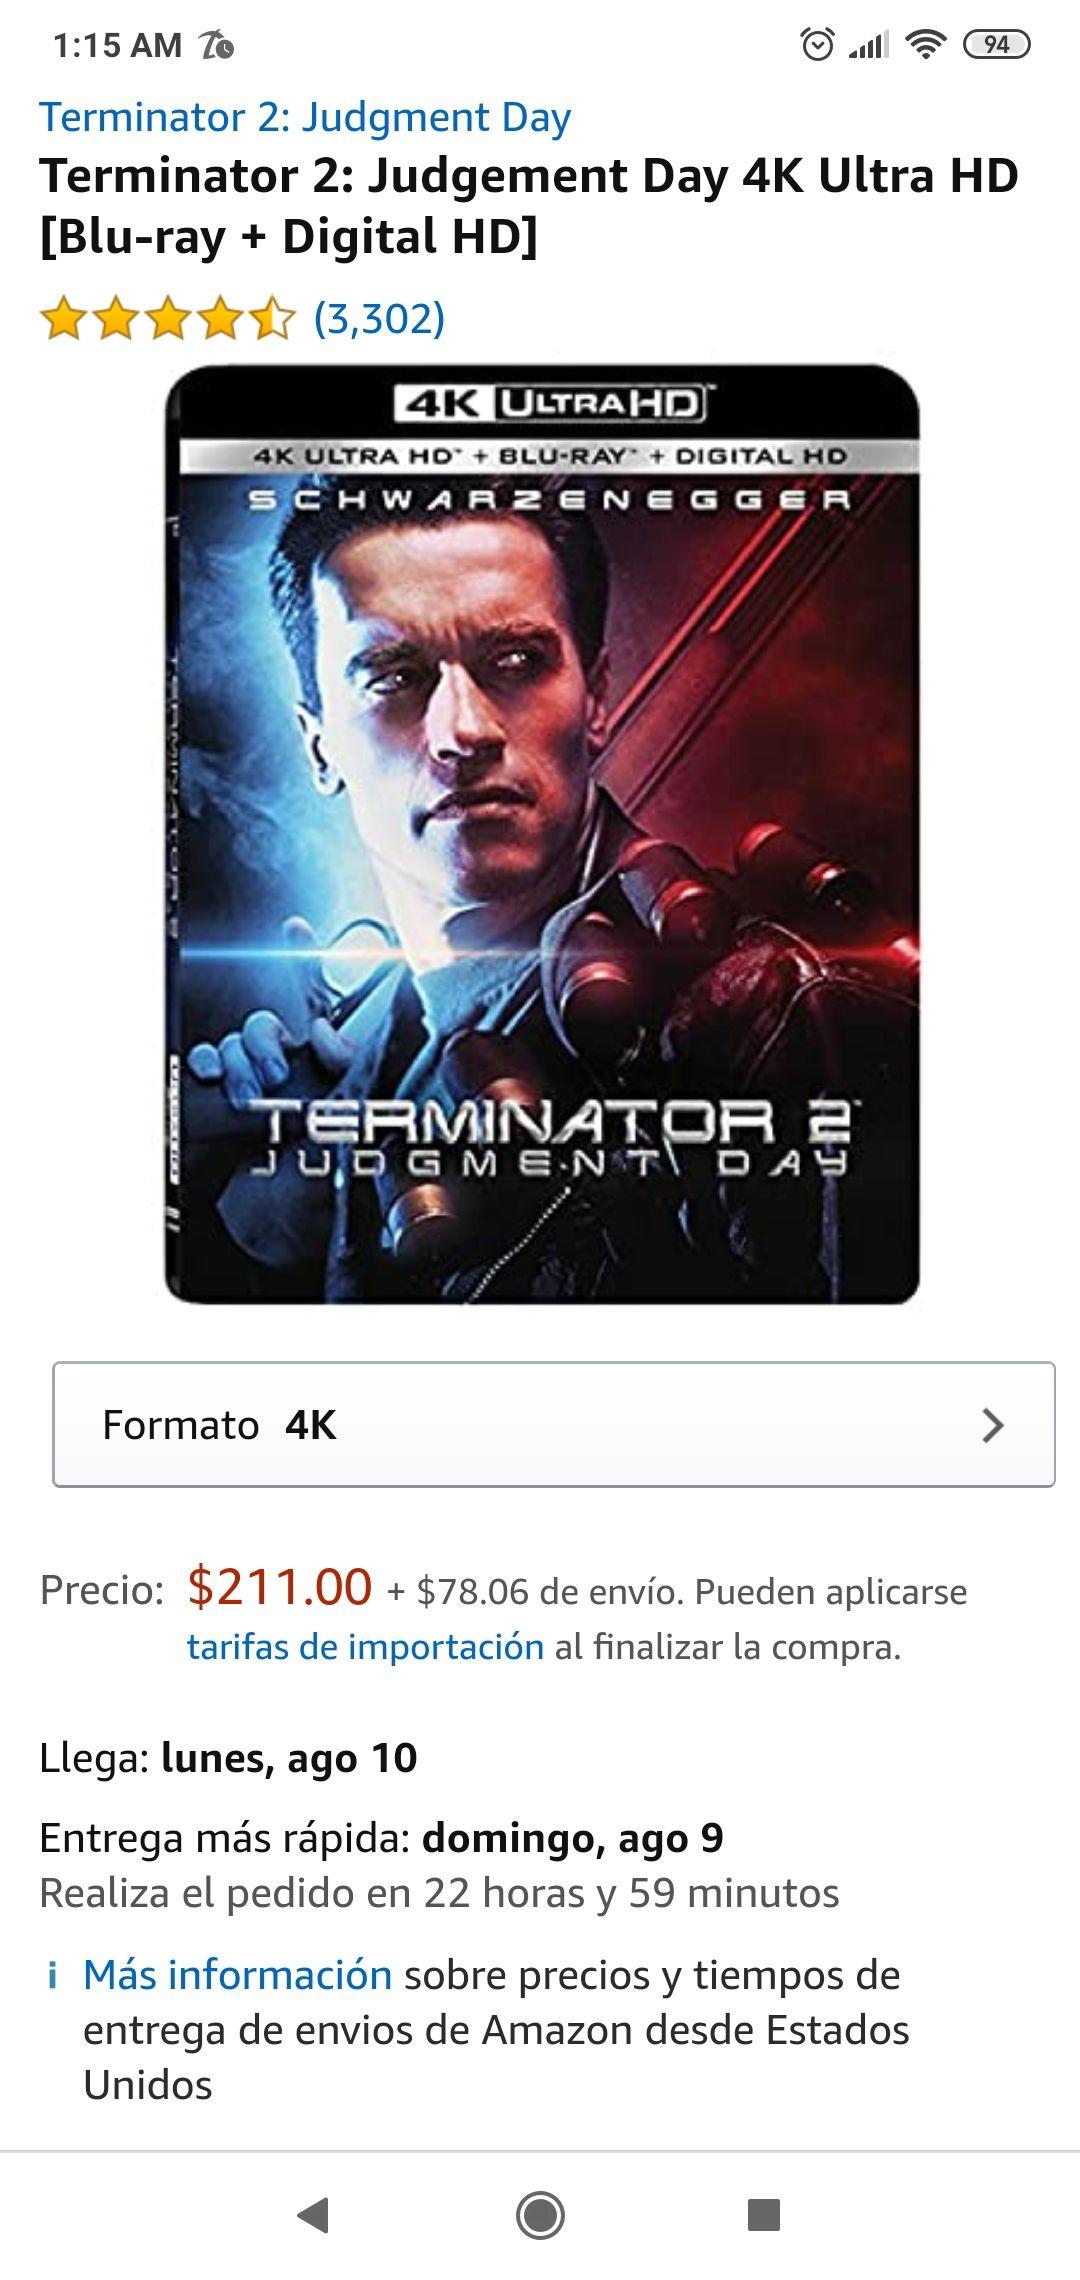 Amazon: Terminator 2: Judgement Day 4K (Blu-ray + Digital HD)